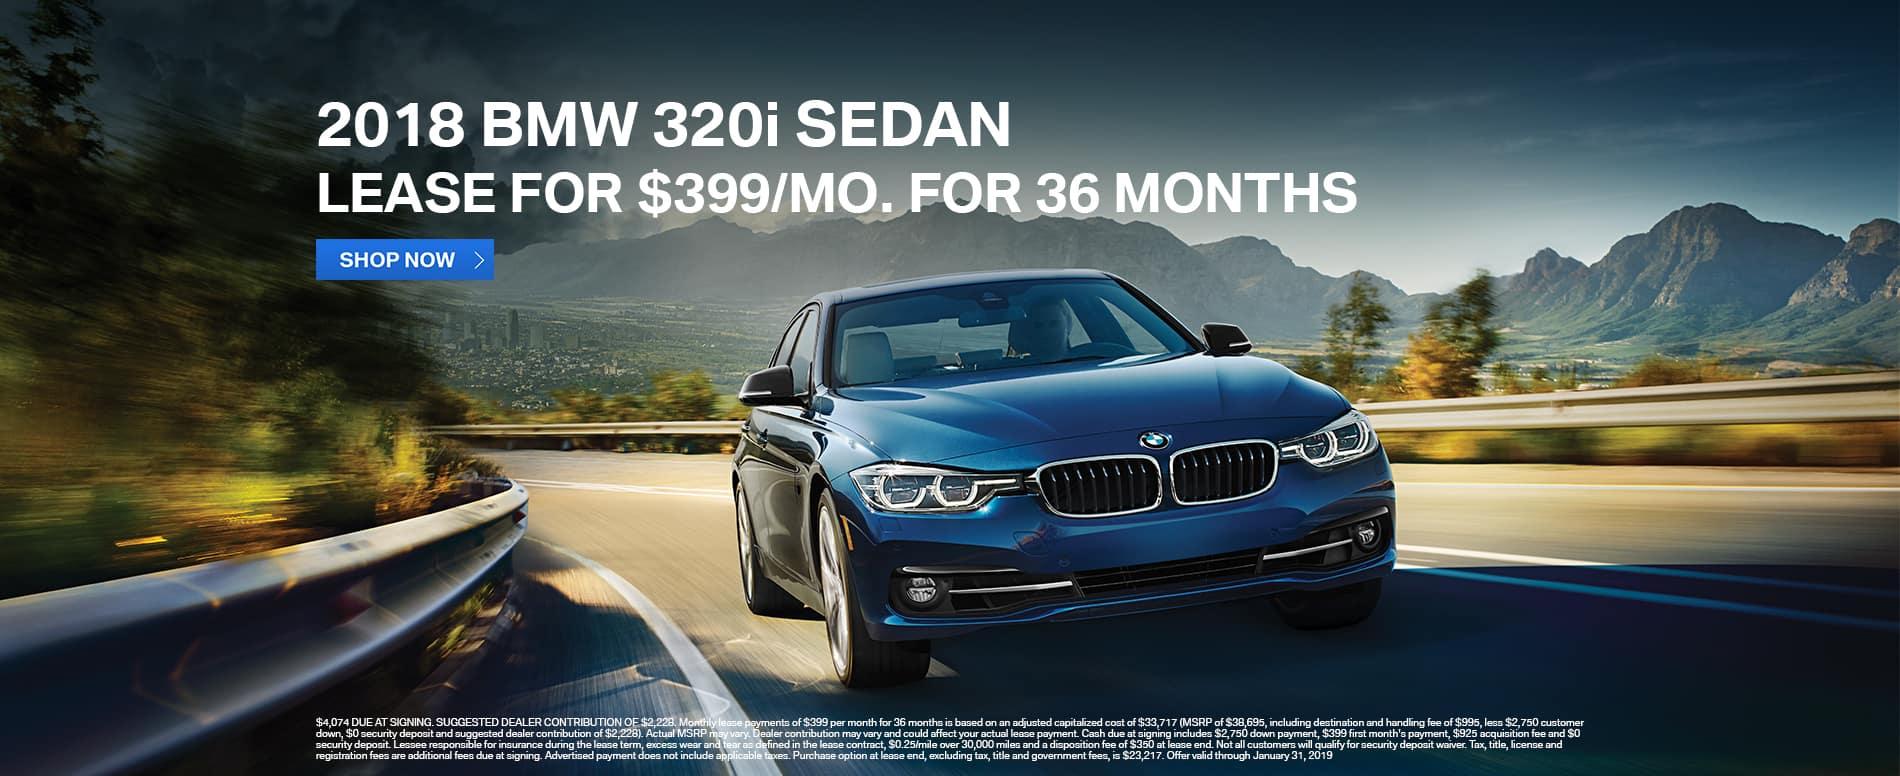 lease-2018-320i-sedan-399-per-month-beaumont